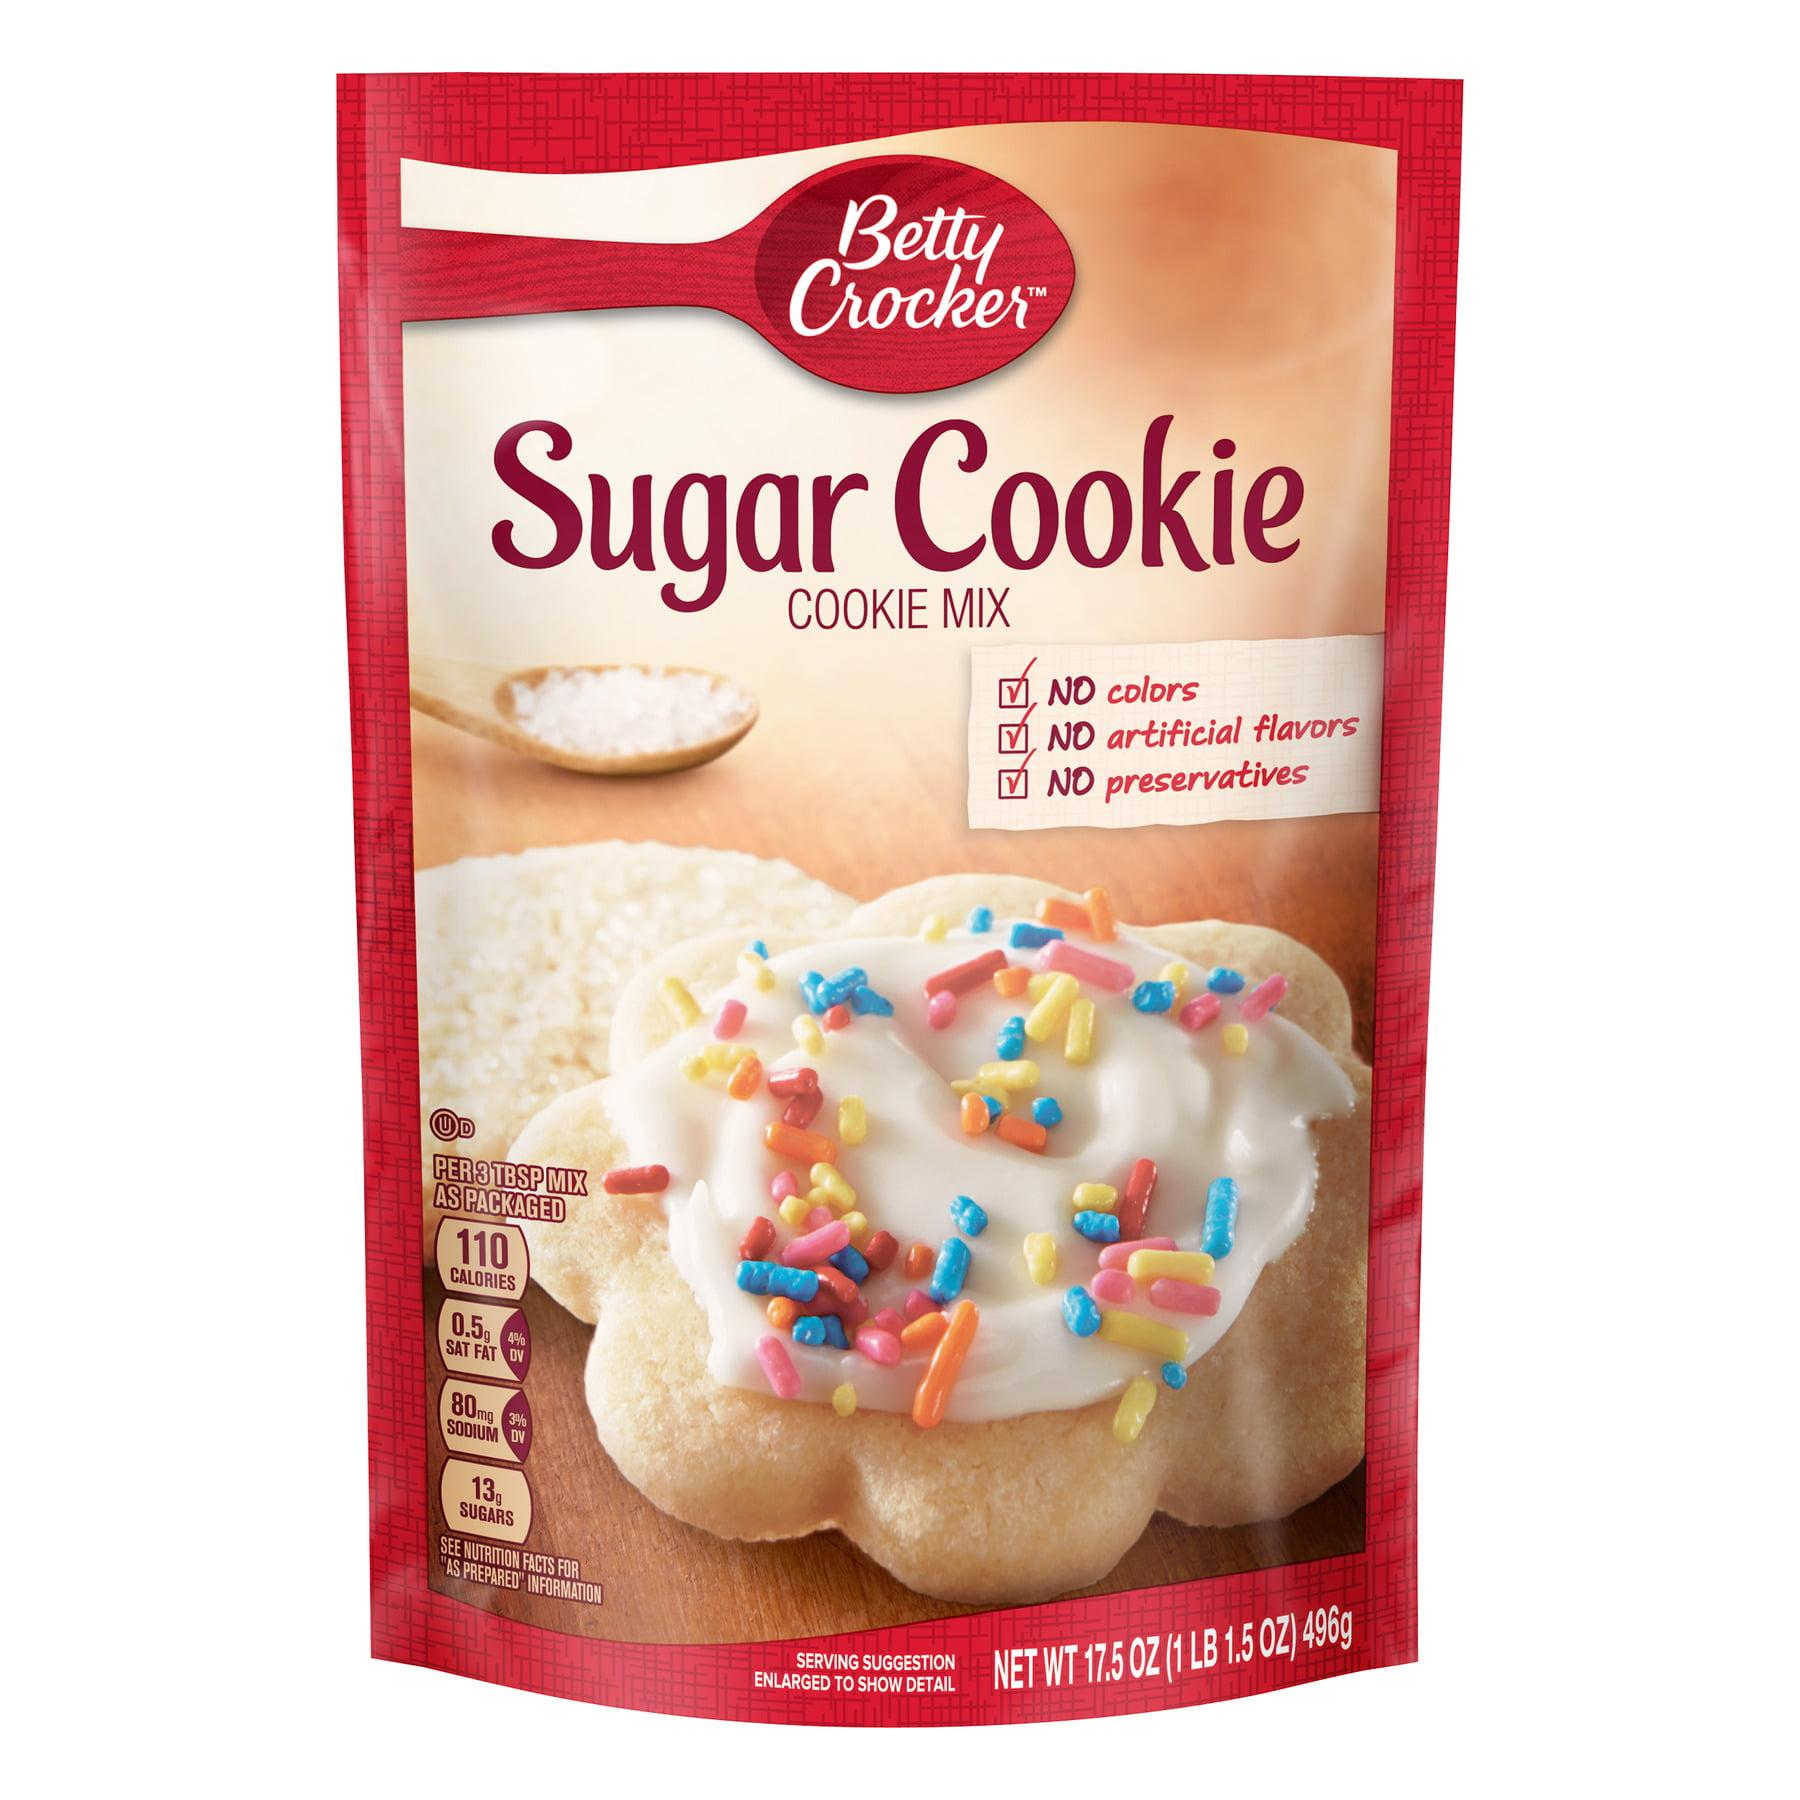 Betty Crocker Baking Mix, Sugar Cookie Mix, 17.5 Oz Pouch